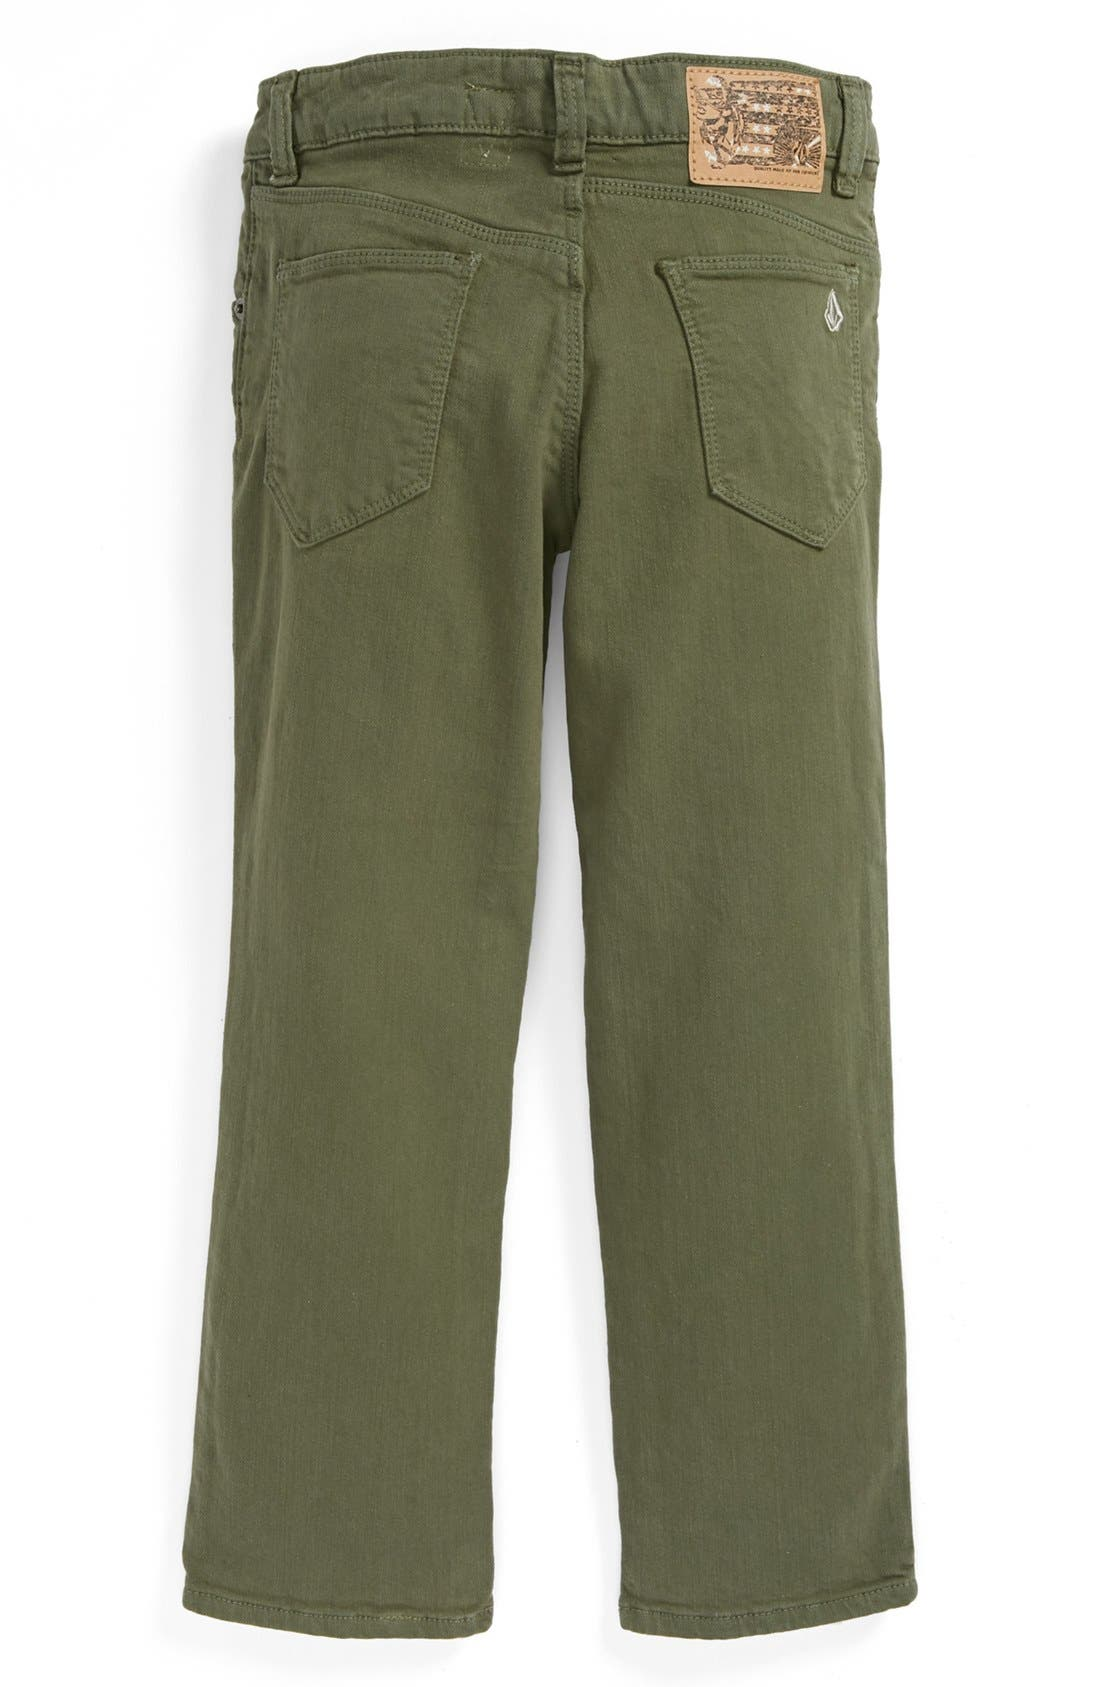 Main Image - Volcom 'Riser' Skinny Jeans (Little Boys & Big Boys)